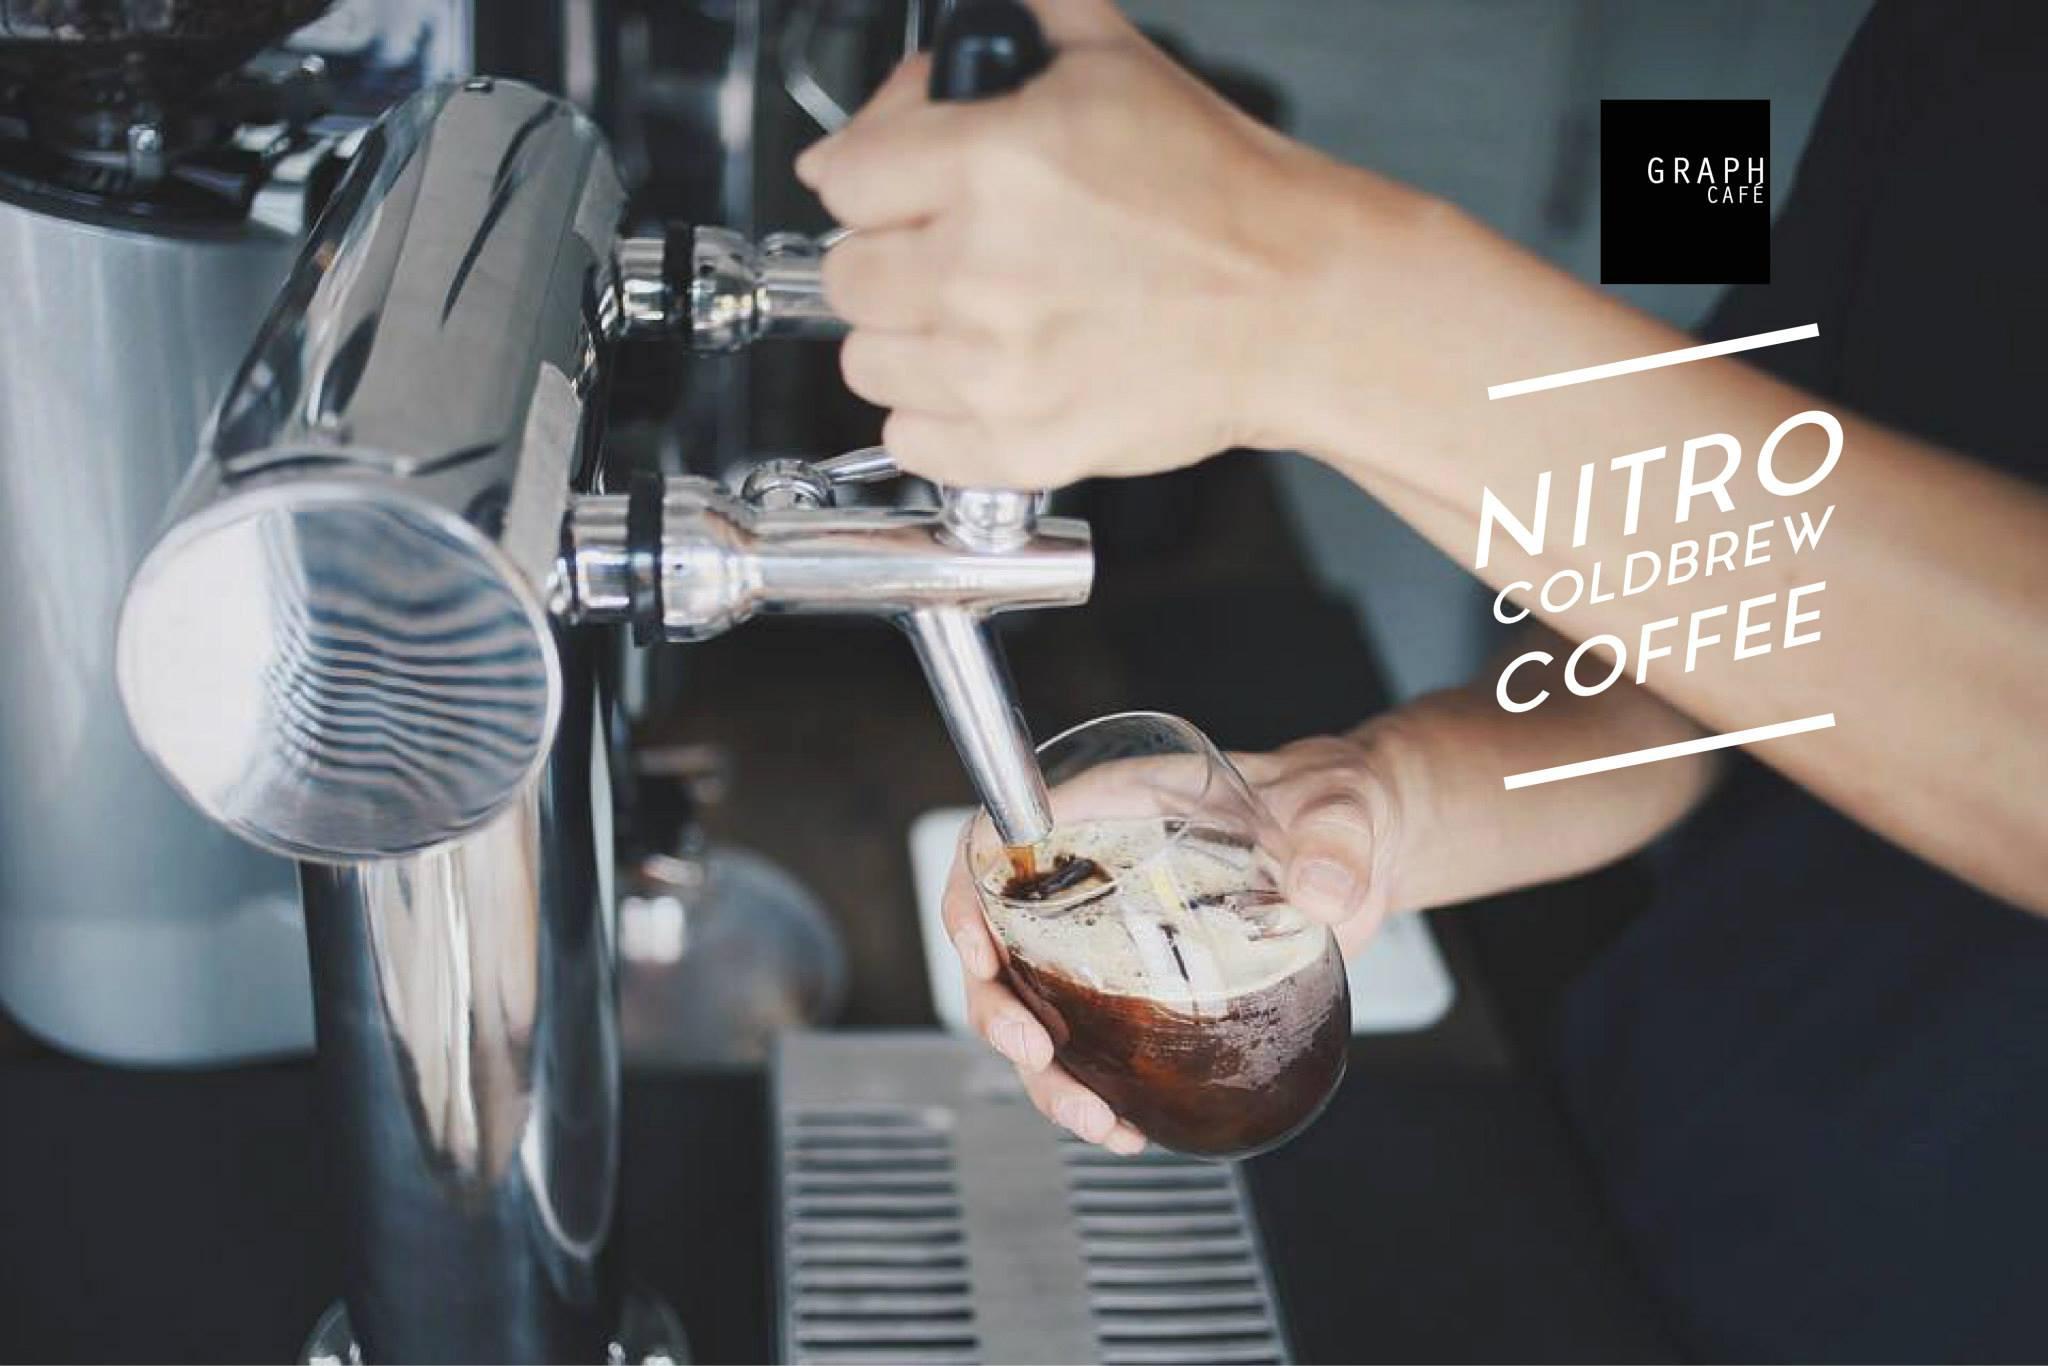 NITRO COLDBREW COFFEE